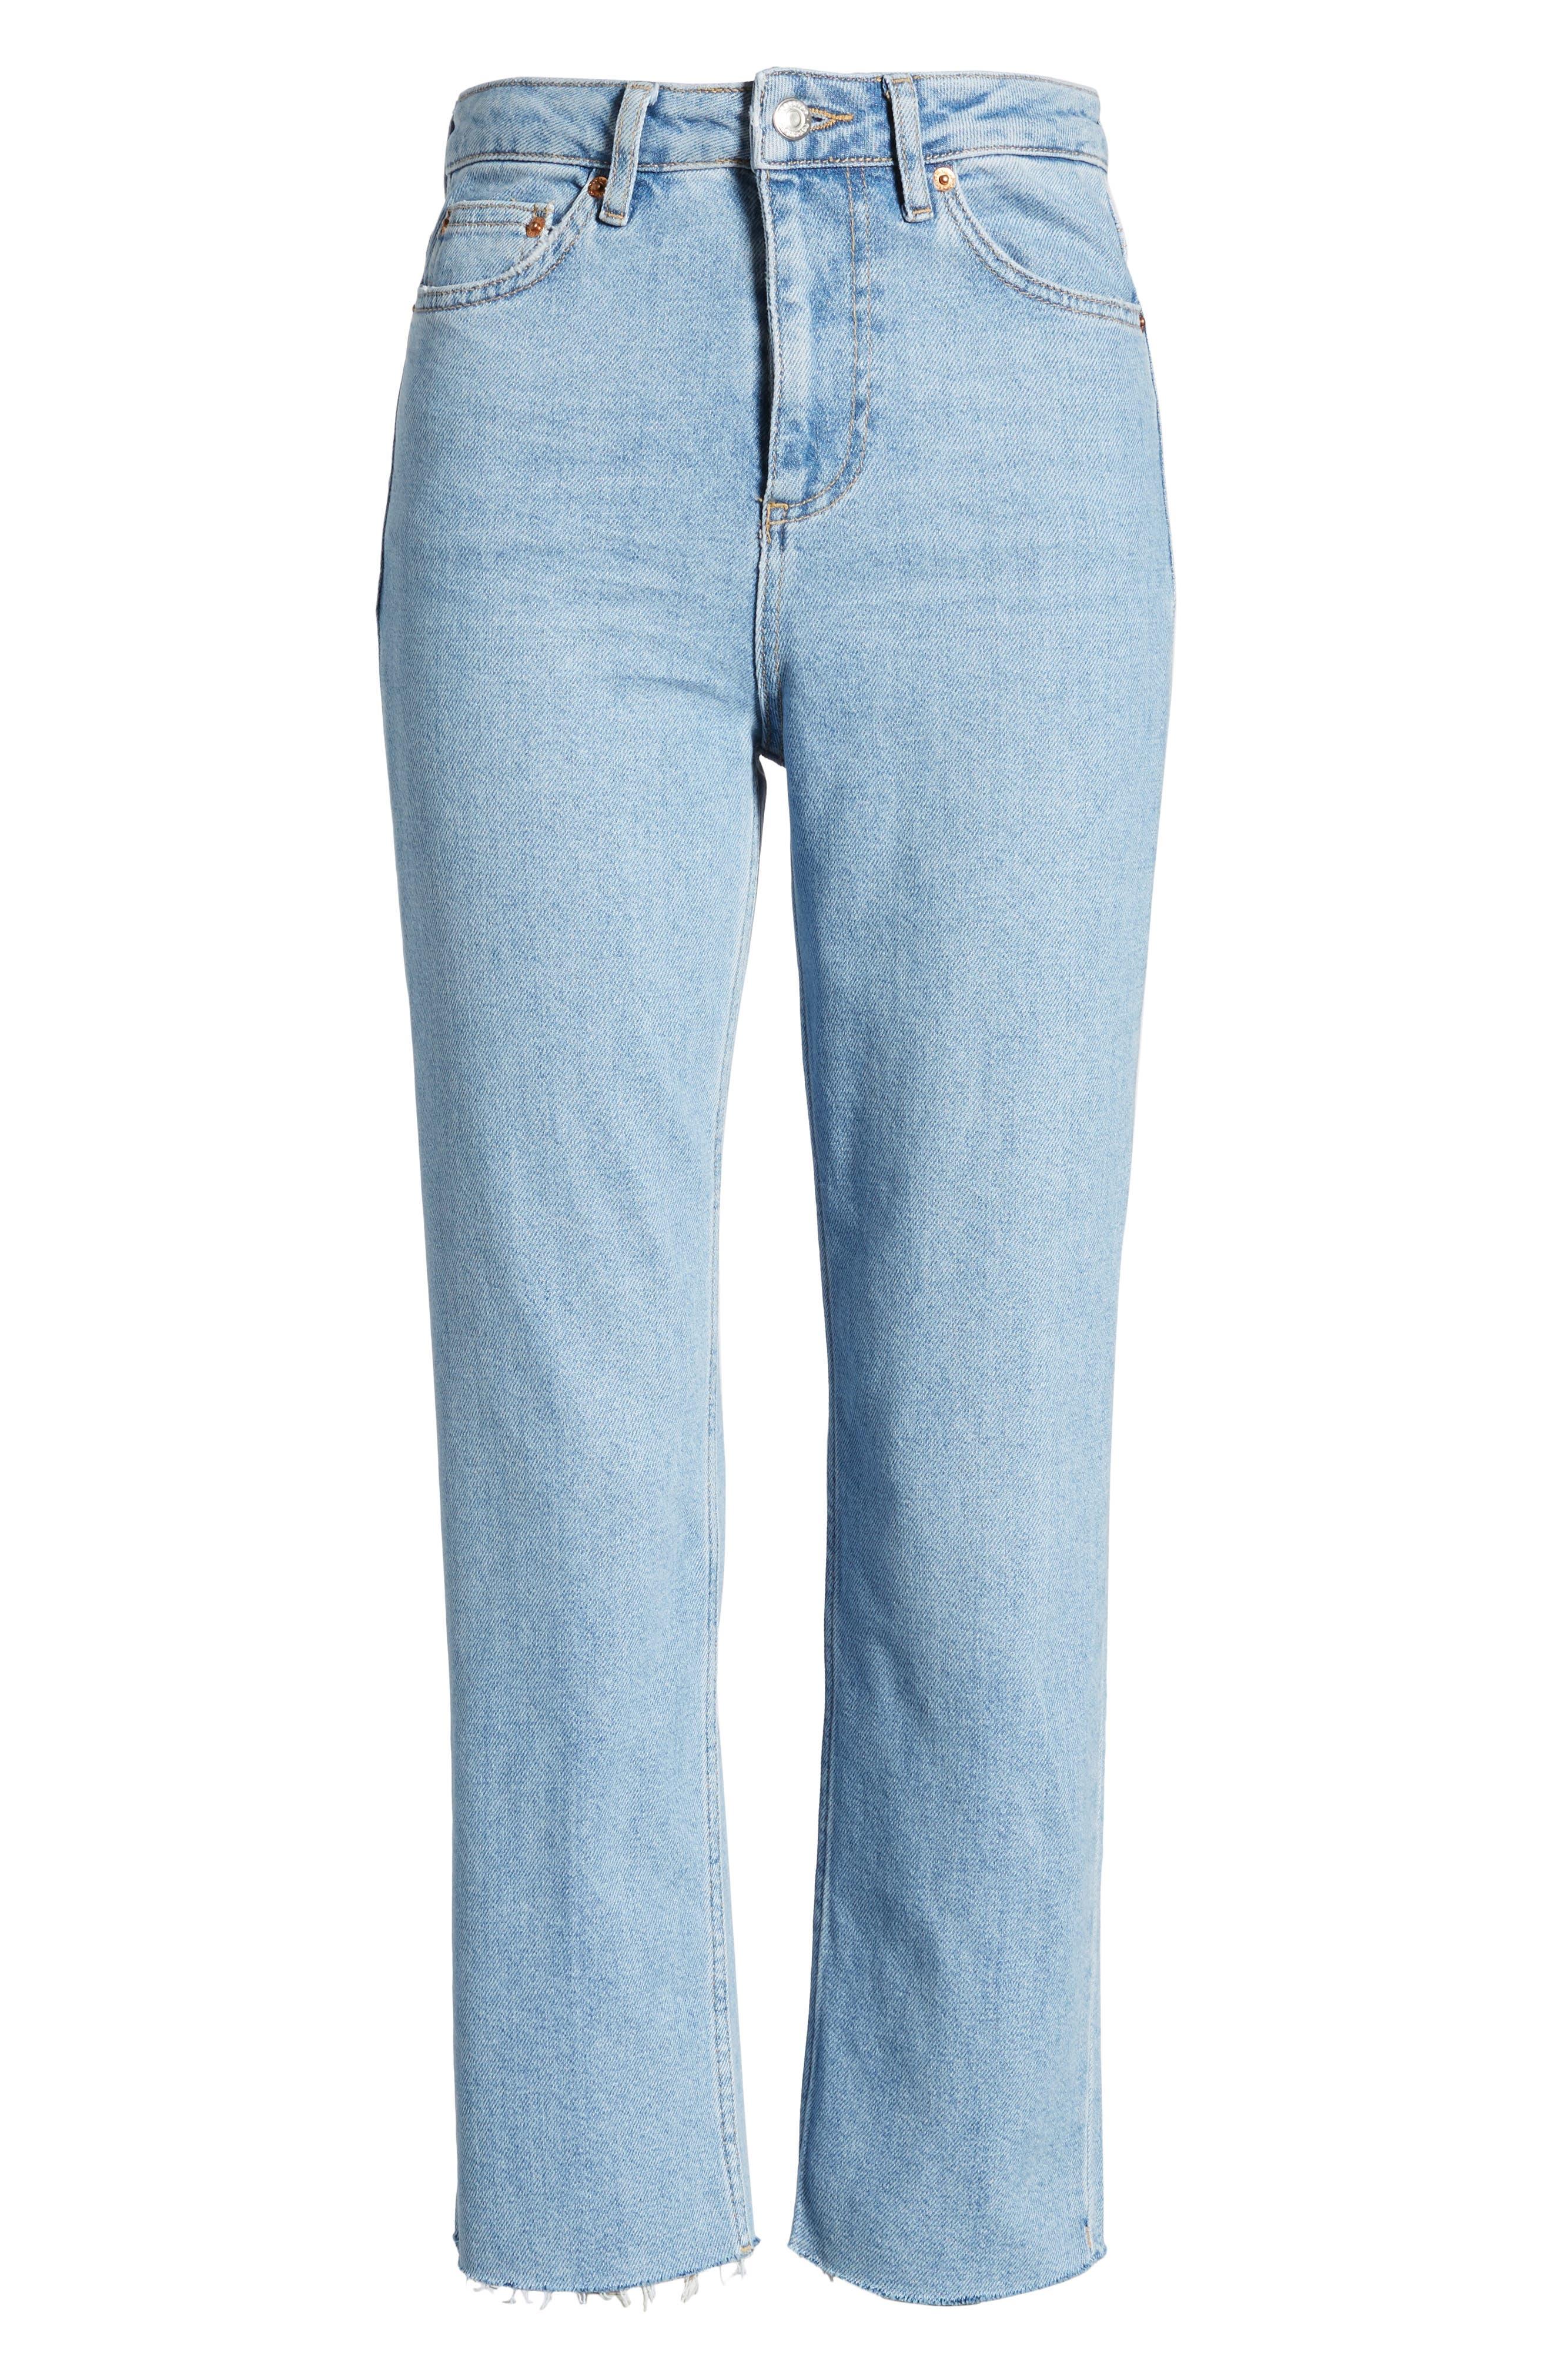 TOPSHOP, Raw Hem Straight Leg Jeans, Alternate thumbnail 7, color, BLEACH STONE DENIM